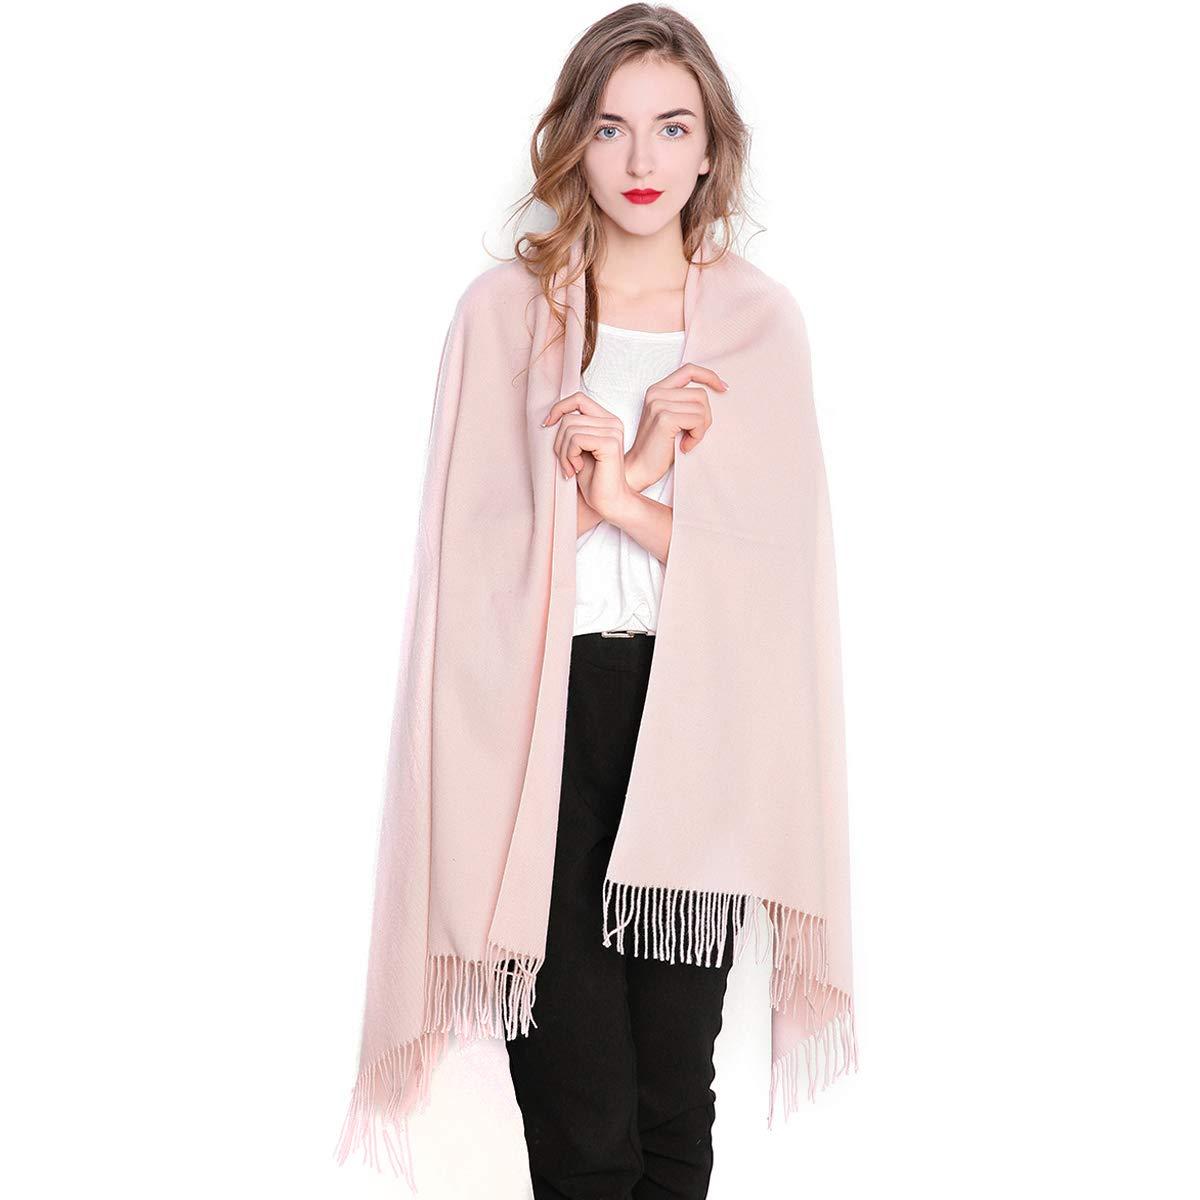 REEMONDE Womens Super Soft Long Shawl Solid Colors Warm Pashmina Big Scarf (Light pink)